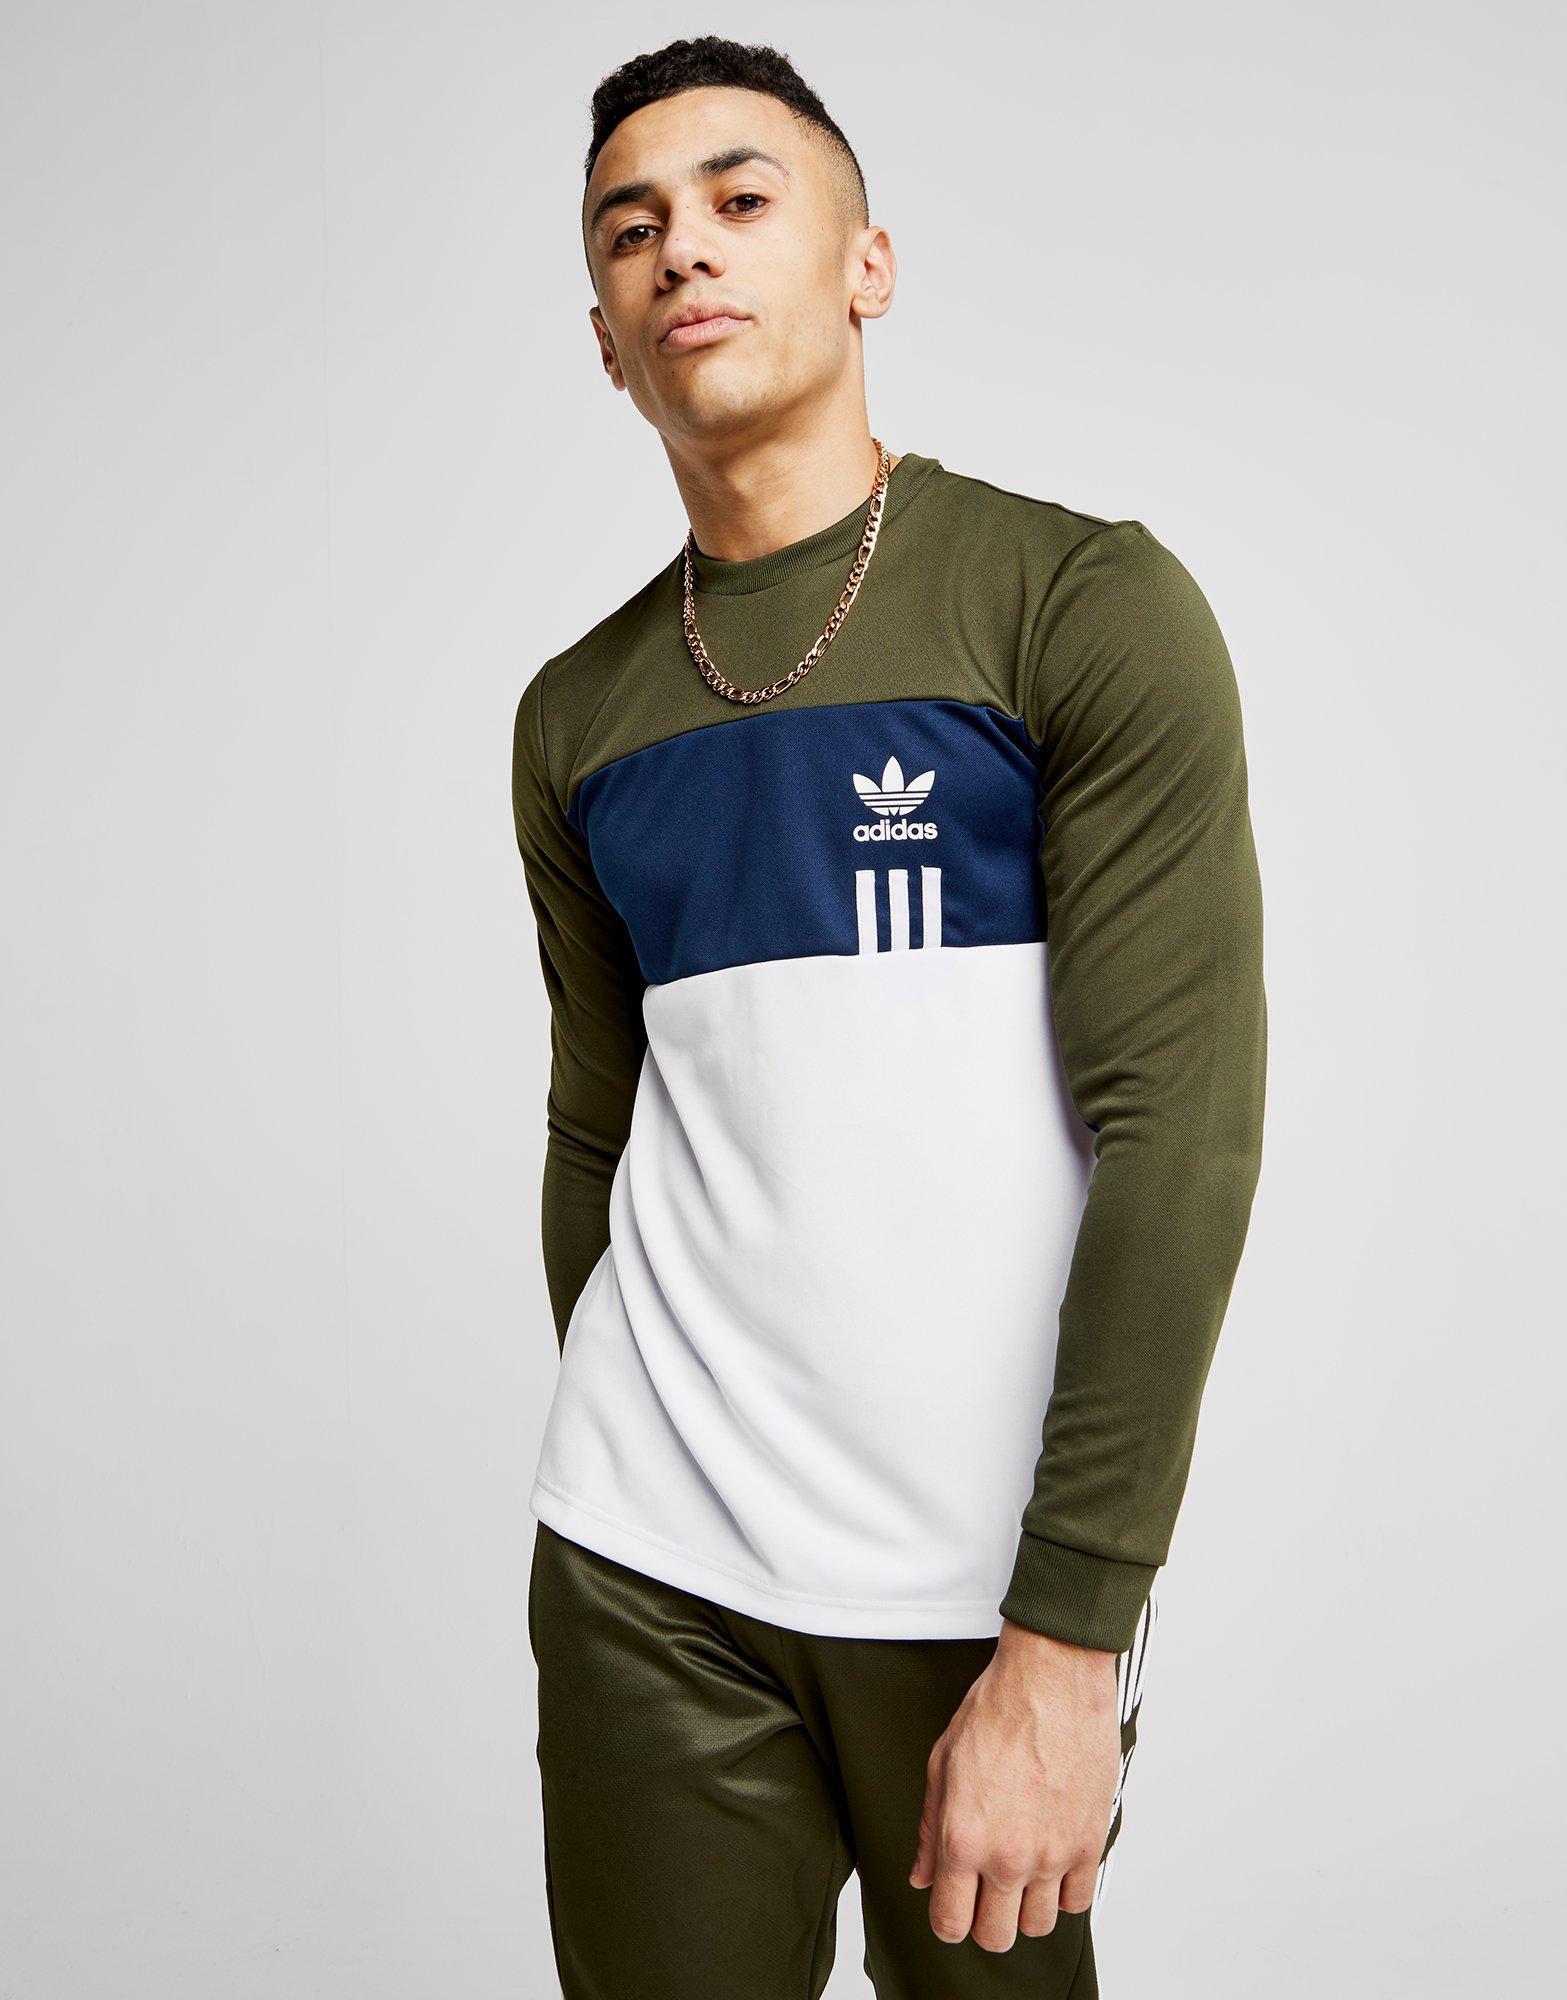 8e5e2d89 adidas Originals Id96 Long Sleeve T-shirt for Men - Lyst